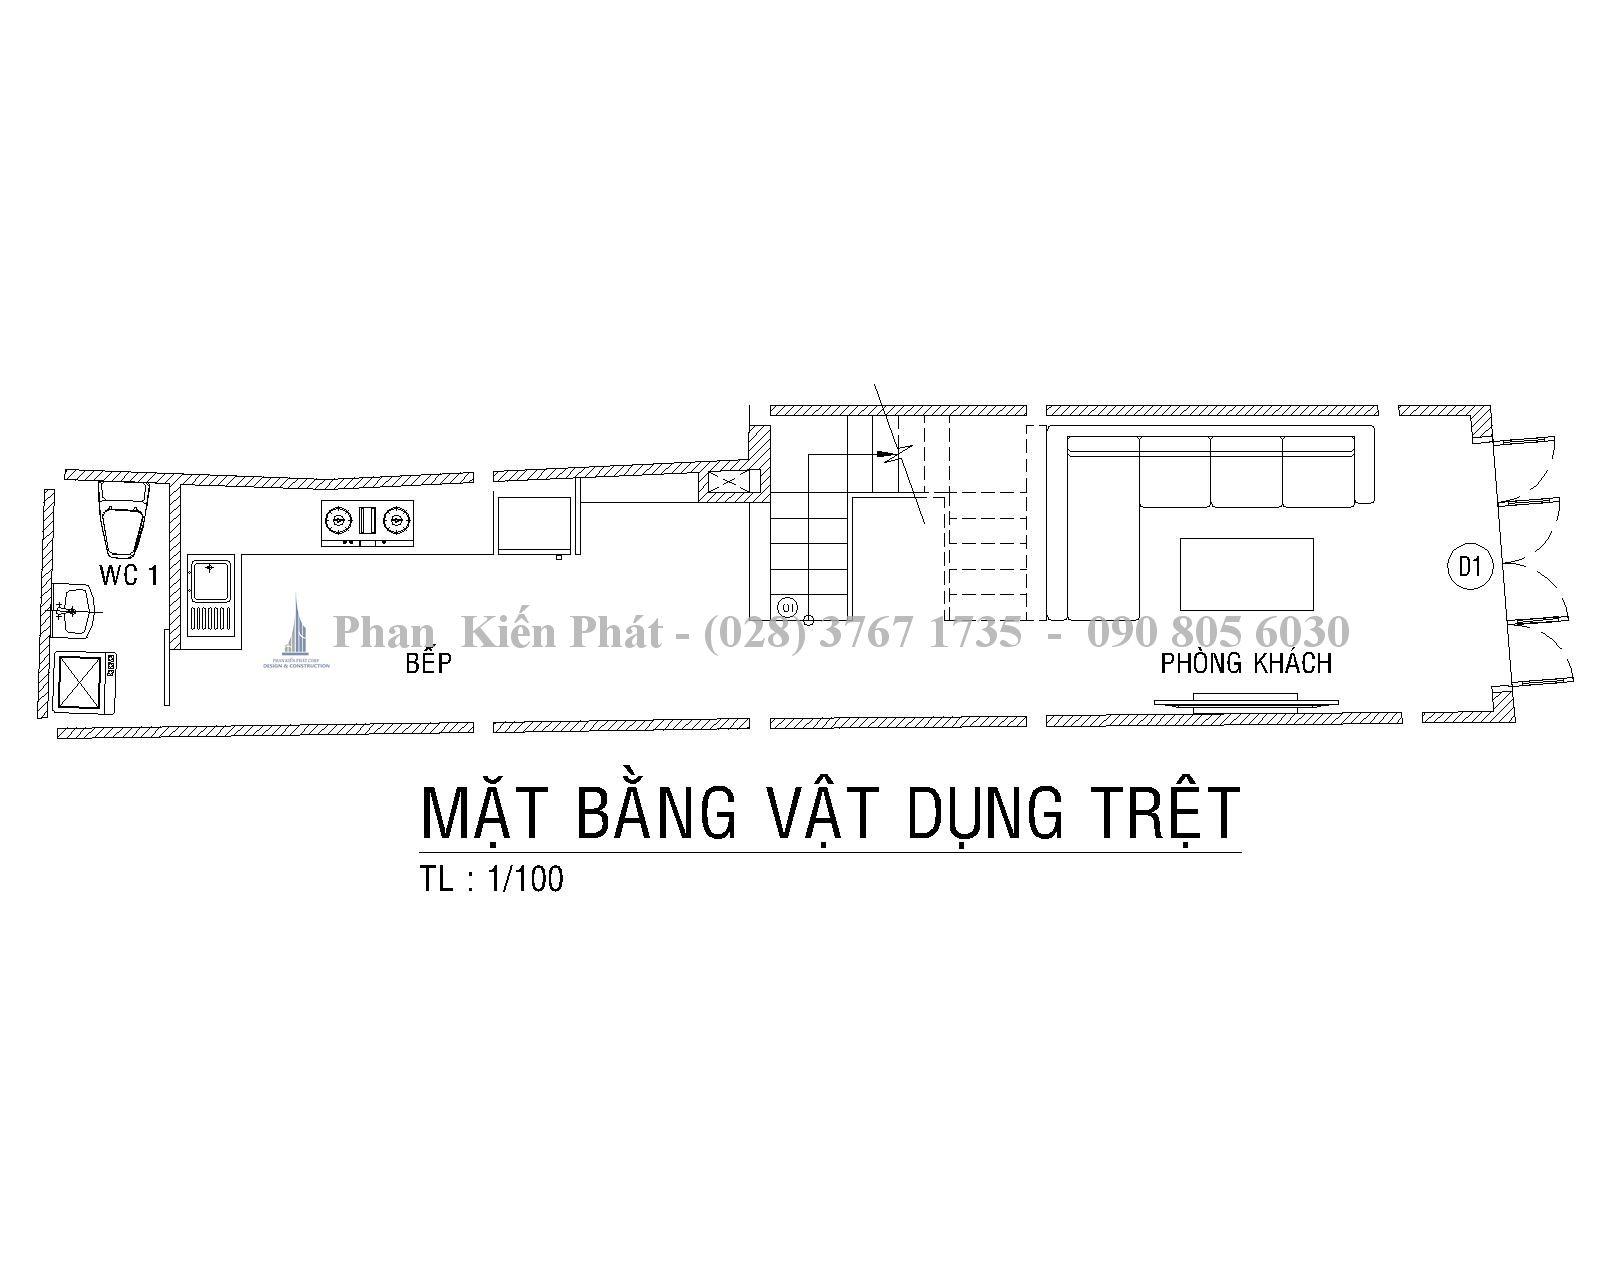 Mat Bang Tret Mau Nha Ong 1 Tret 1lung 3 Lau Hien Dai Anh Tan Dinh 1